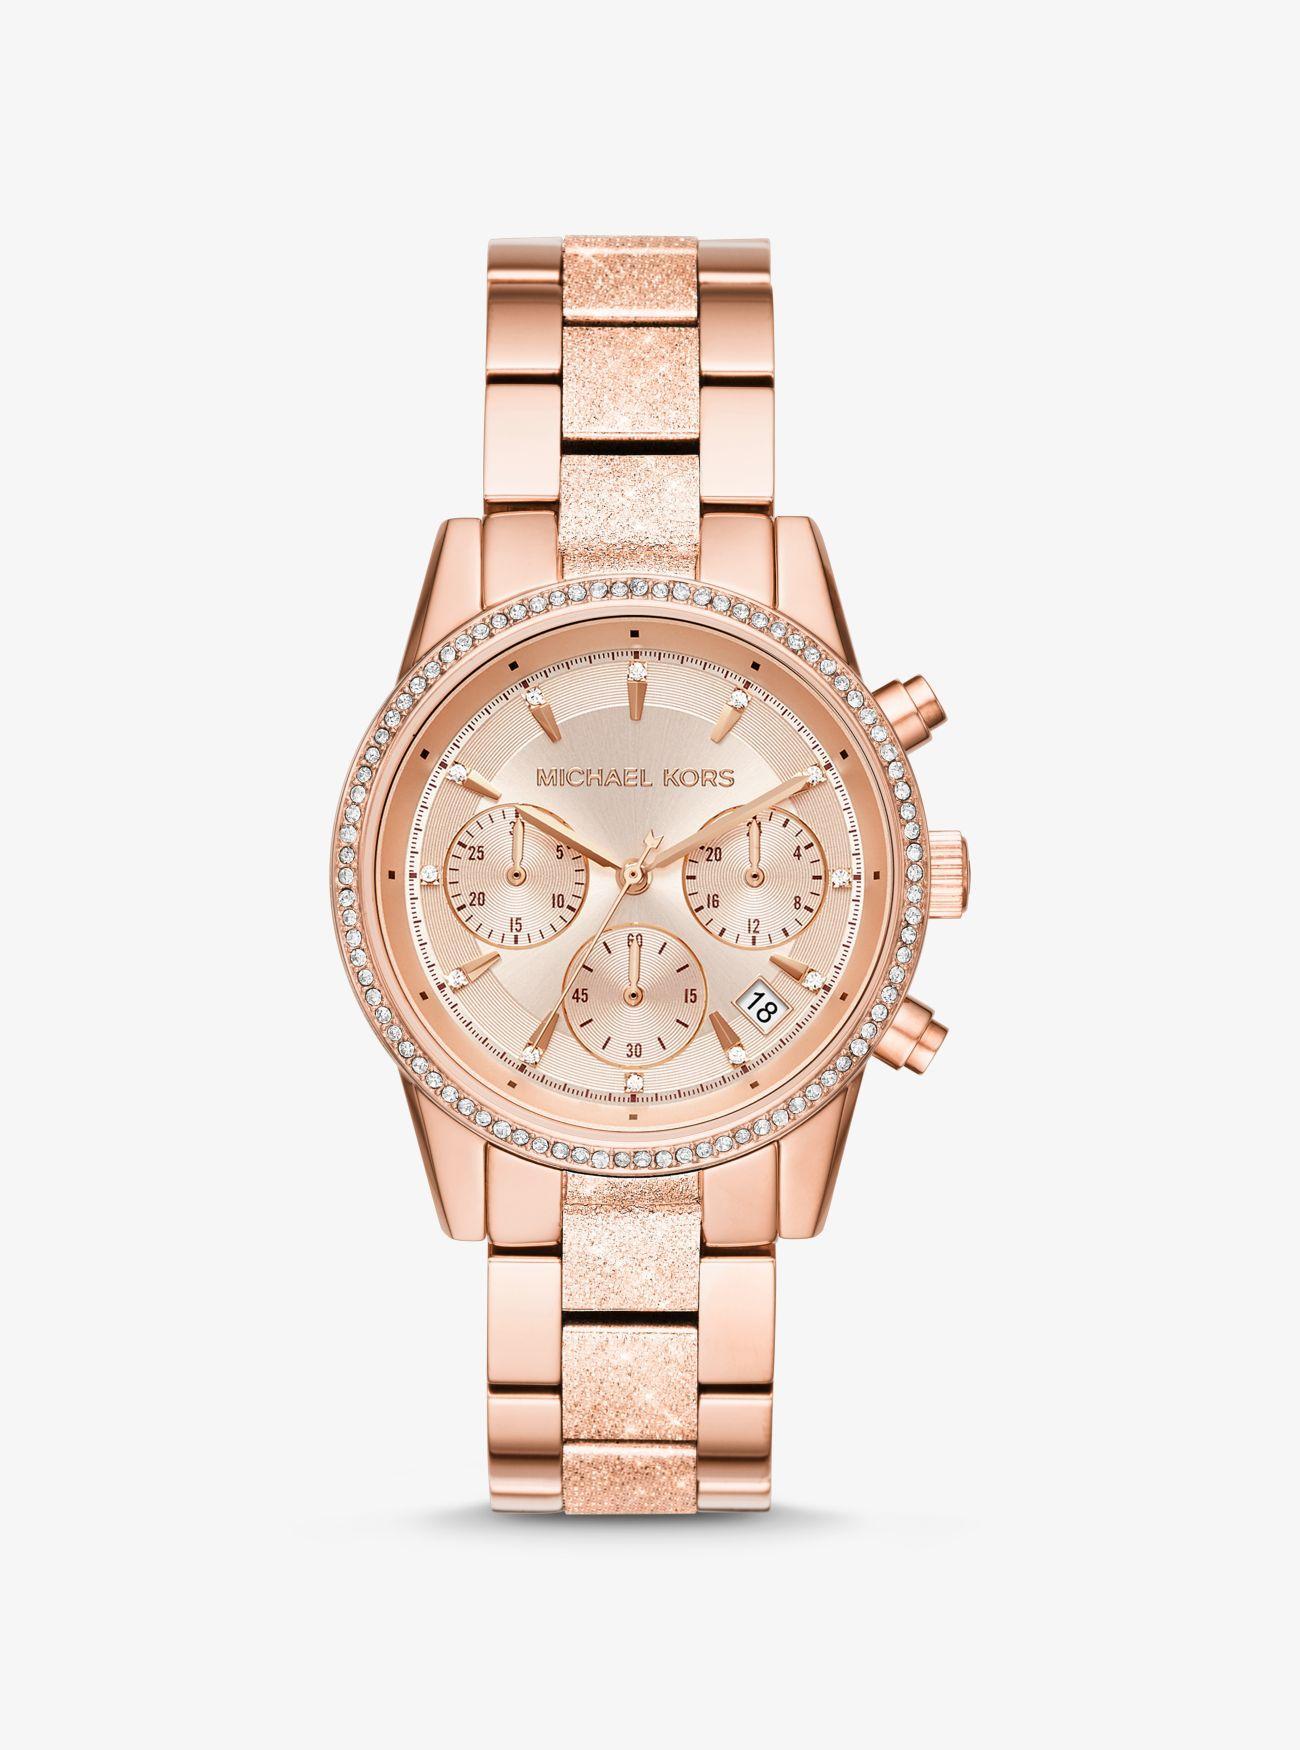 6cd7ea620b63 Lyst - Michael Kors Ritz Pave Textured Rose Gold-tone Watch